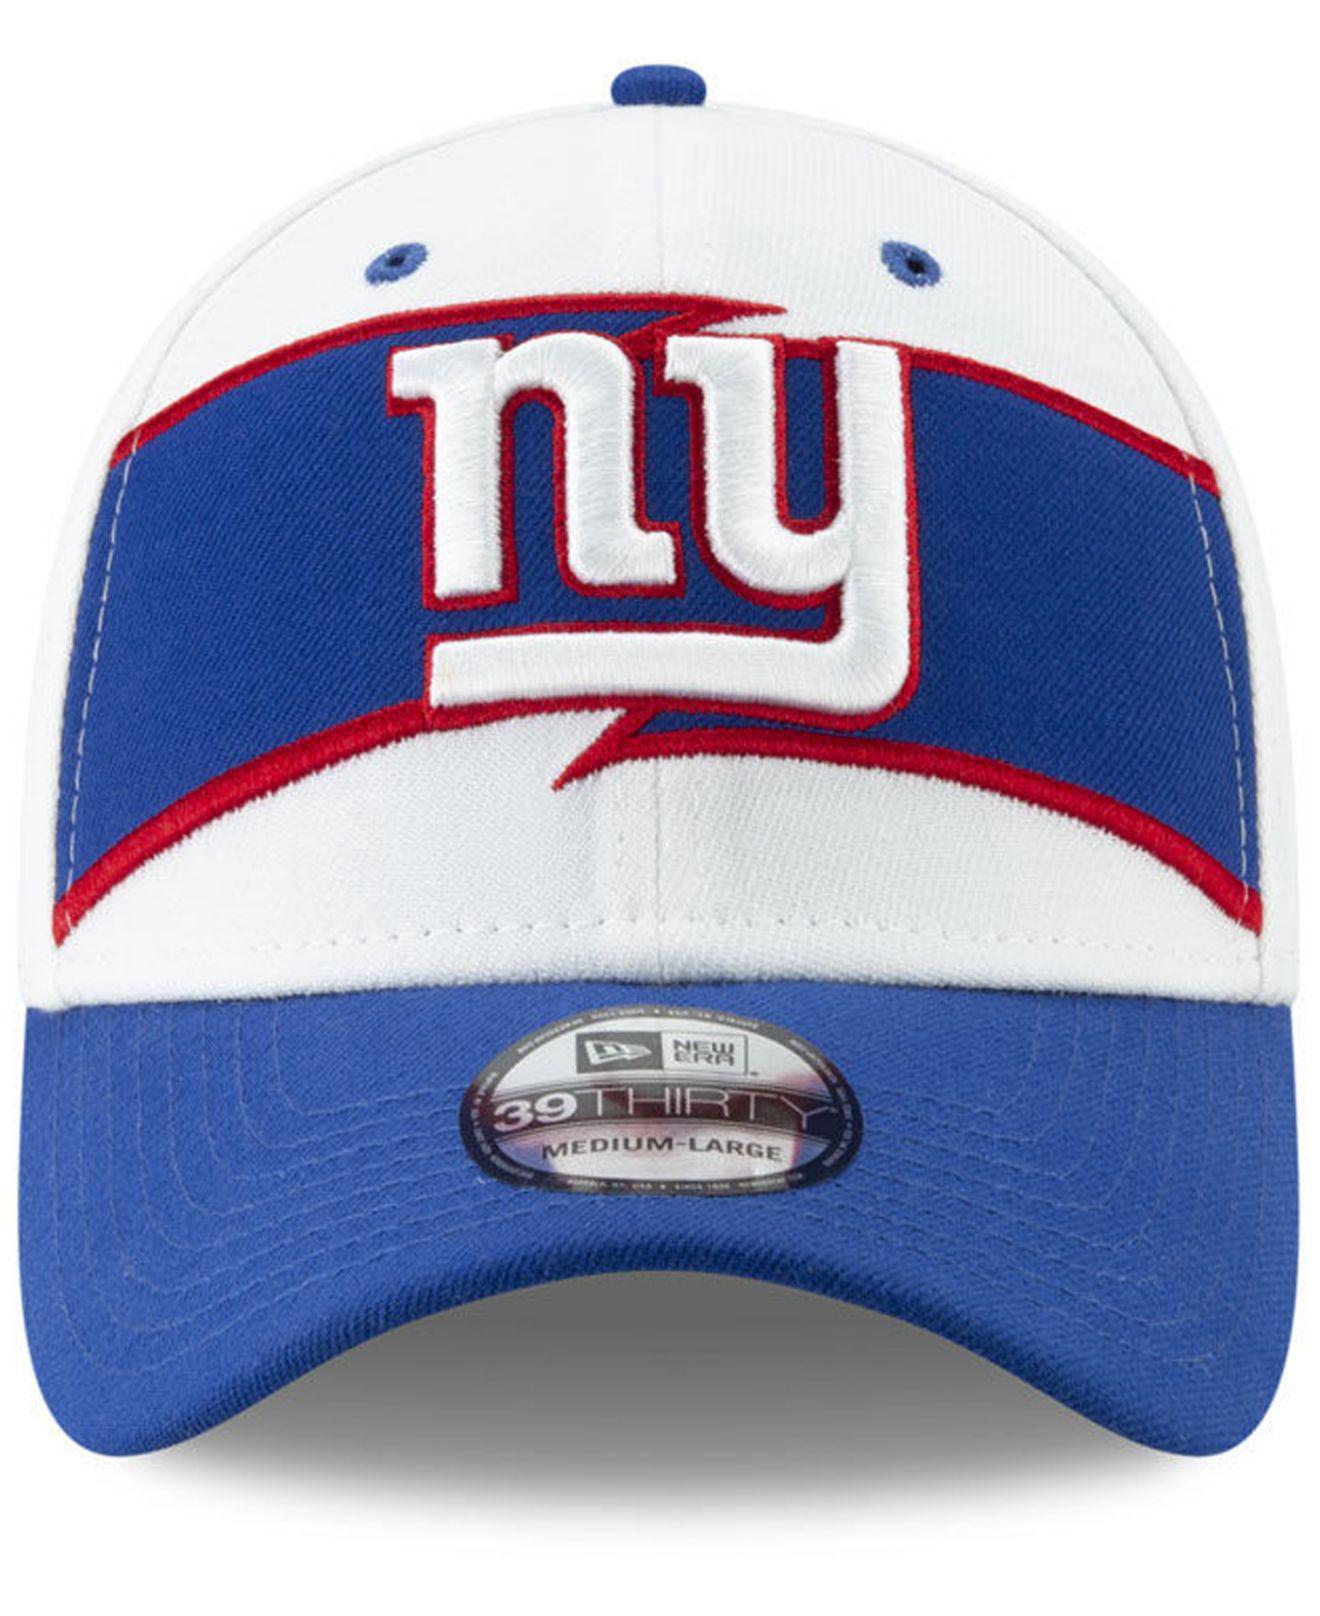 Lyst - Ktz New York Giants Thanksgiving 39thirty Cap in Blue for Men 0483ae8cb